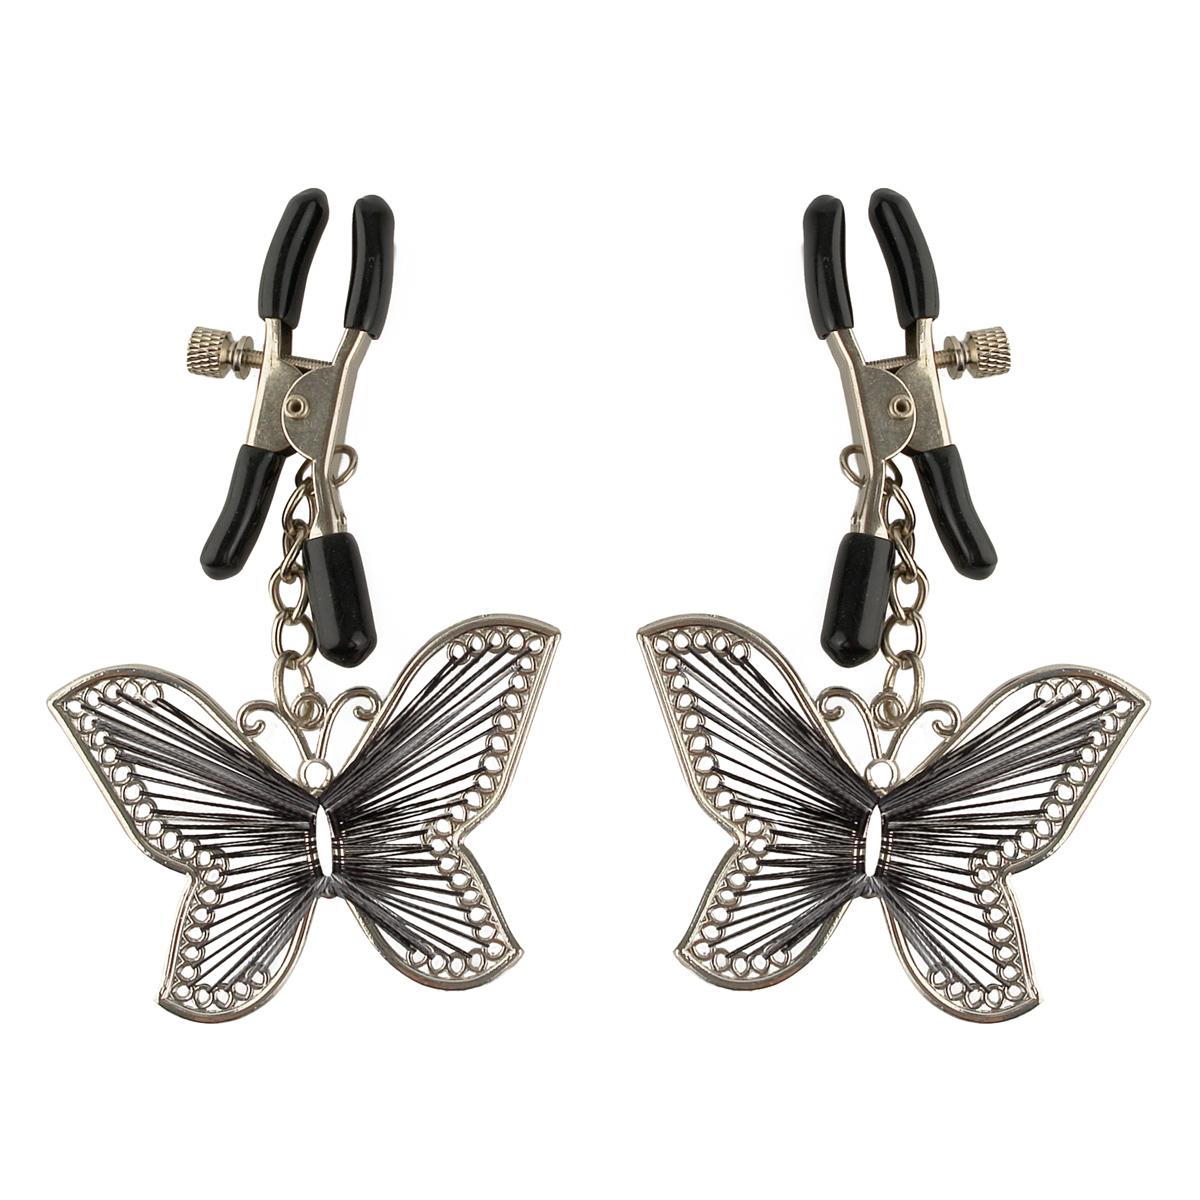 Зажимы на соски с бабочками Butterfly Nipple Clamps - фото 134471